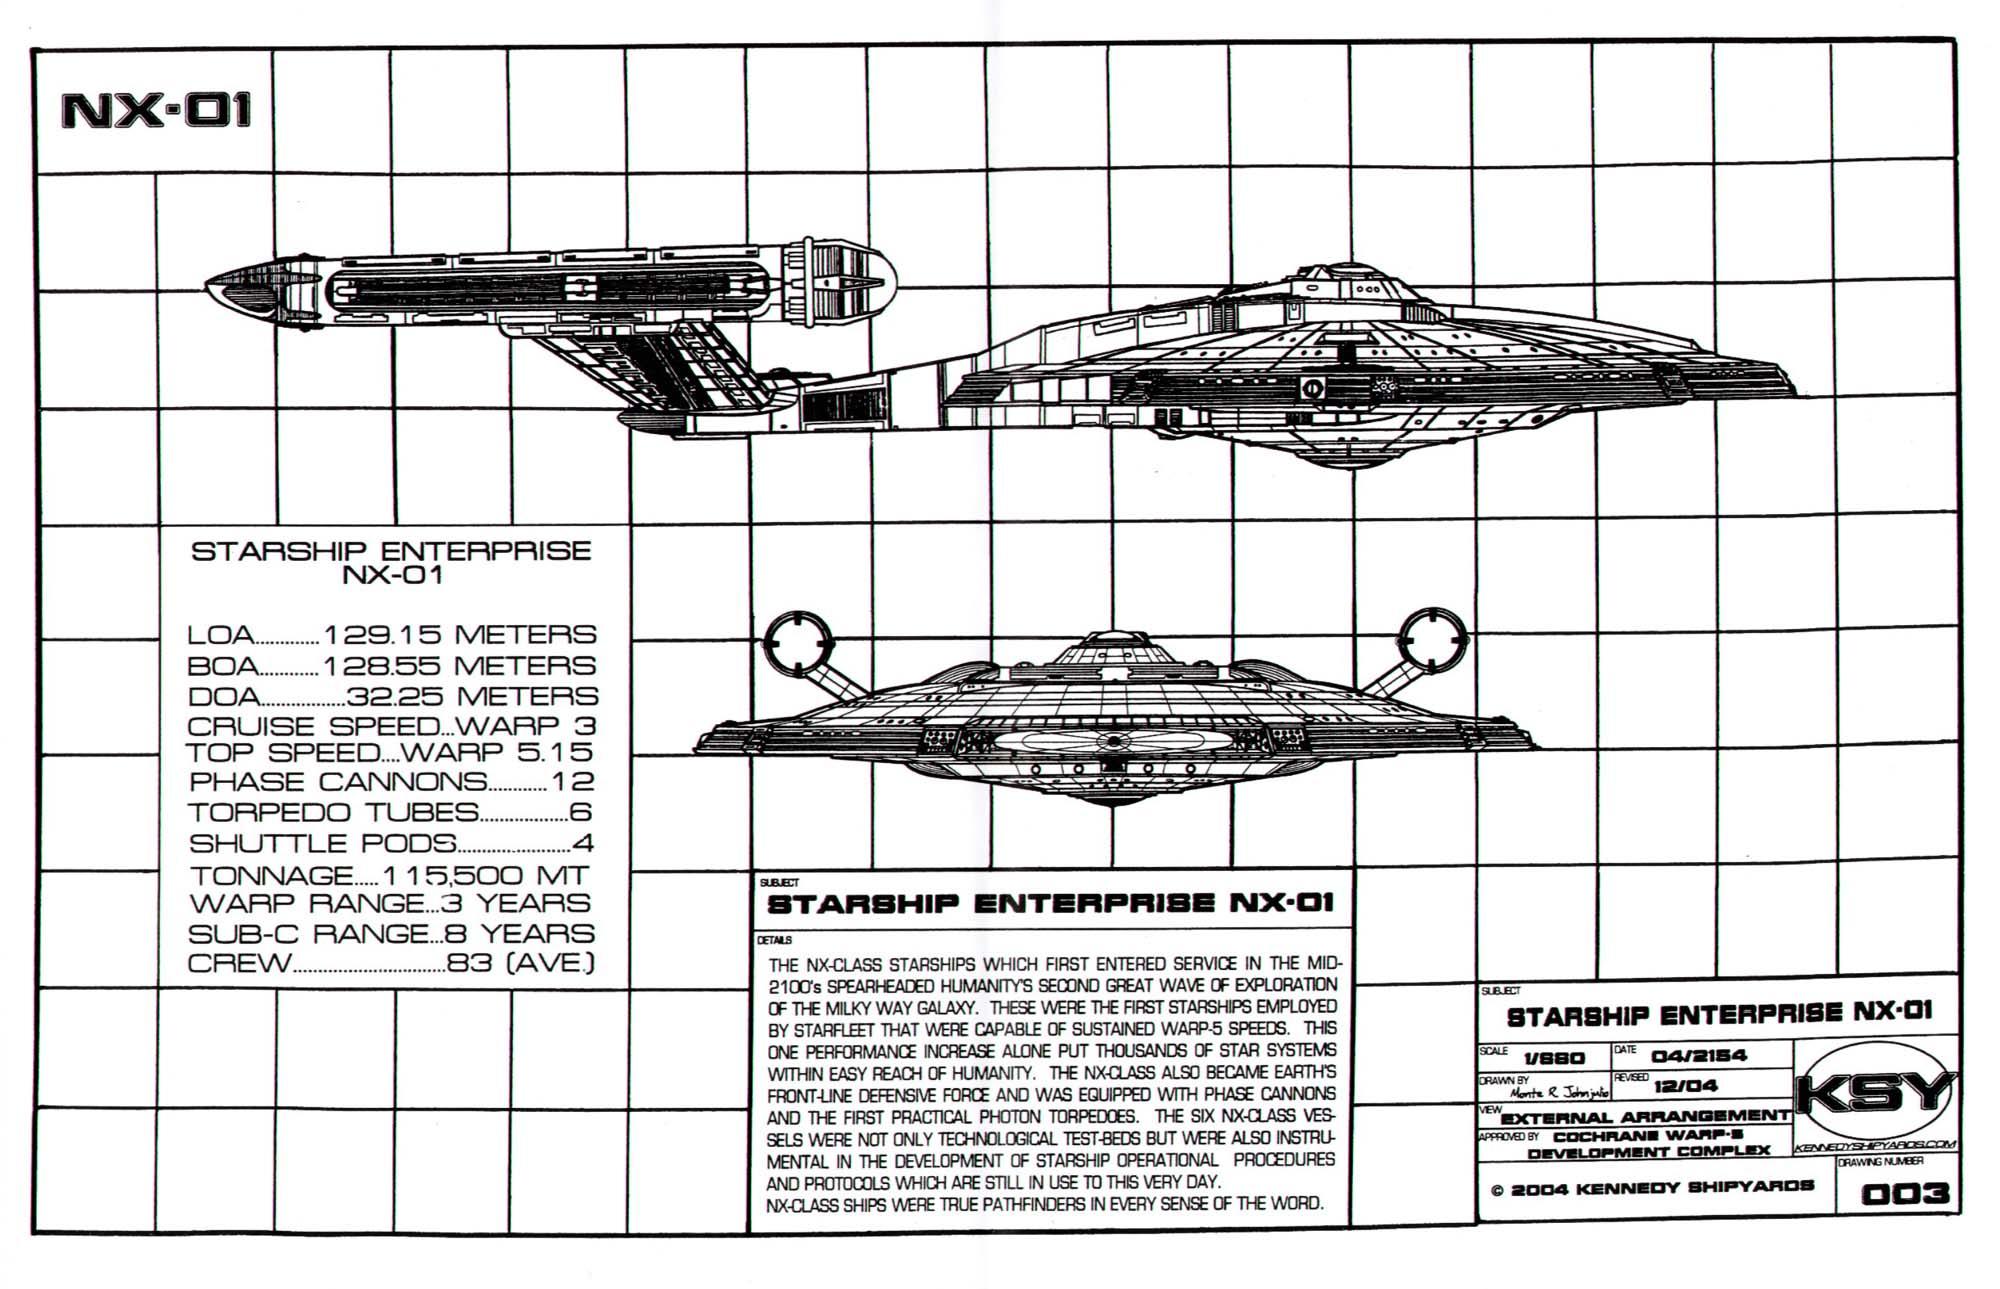 Star Trek Blueprints Starfleet Vessel Enterprise Nx 01